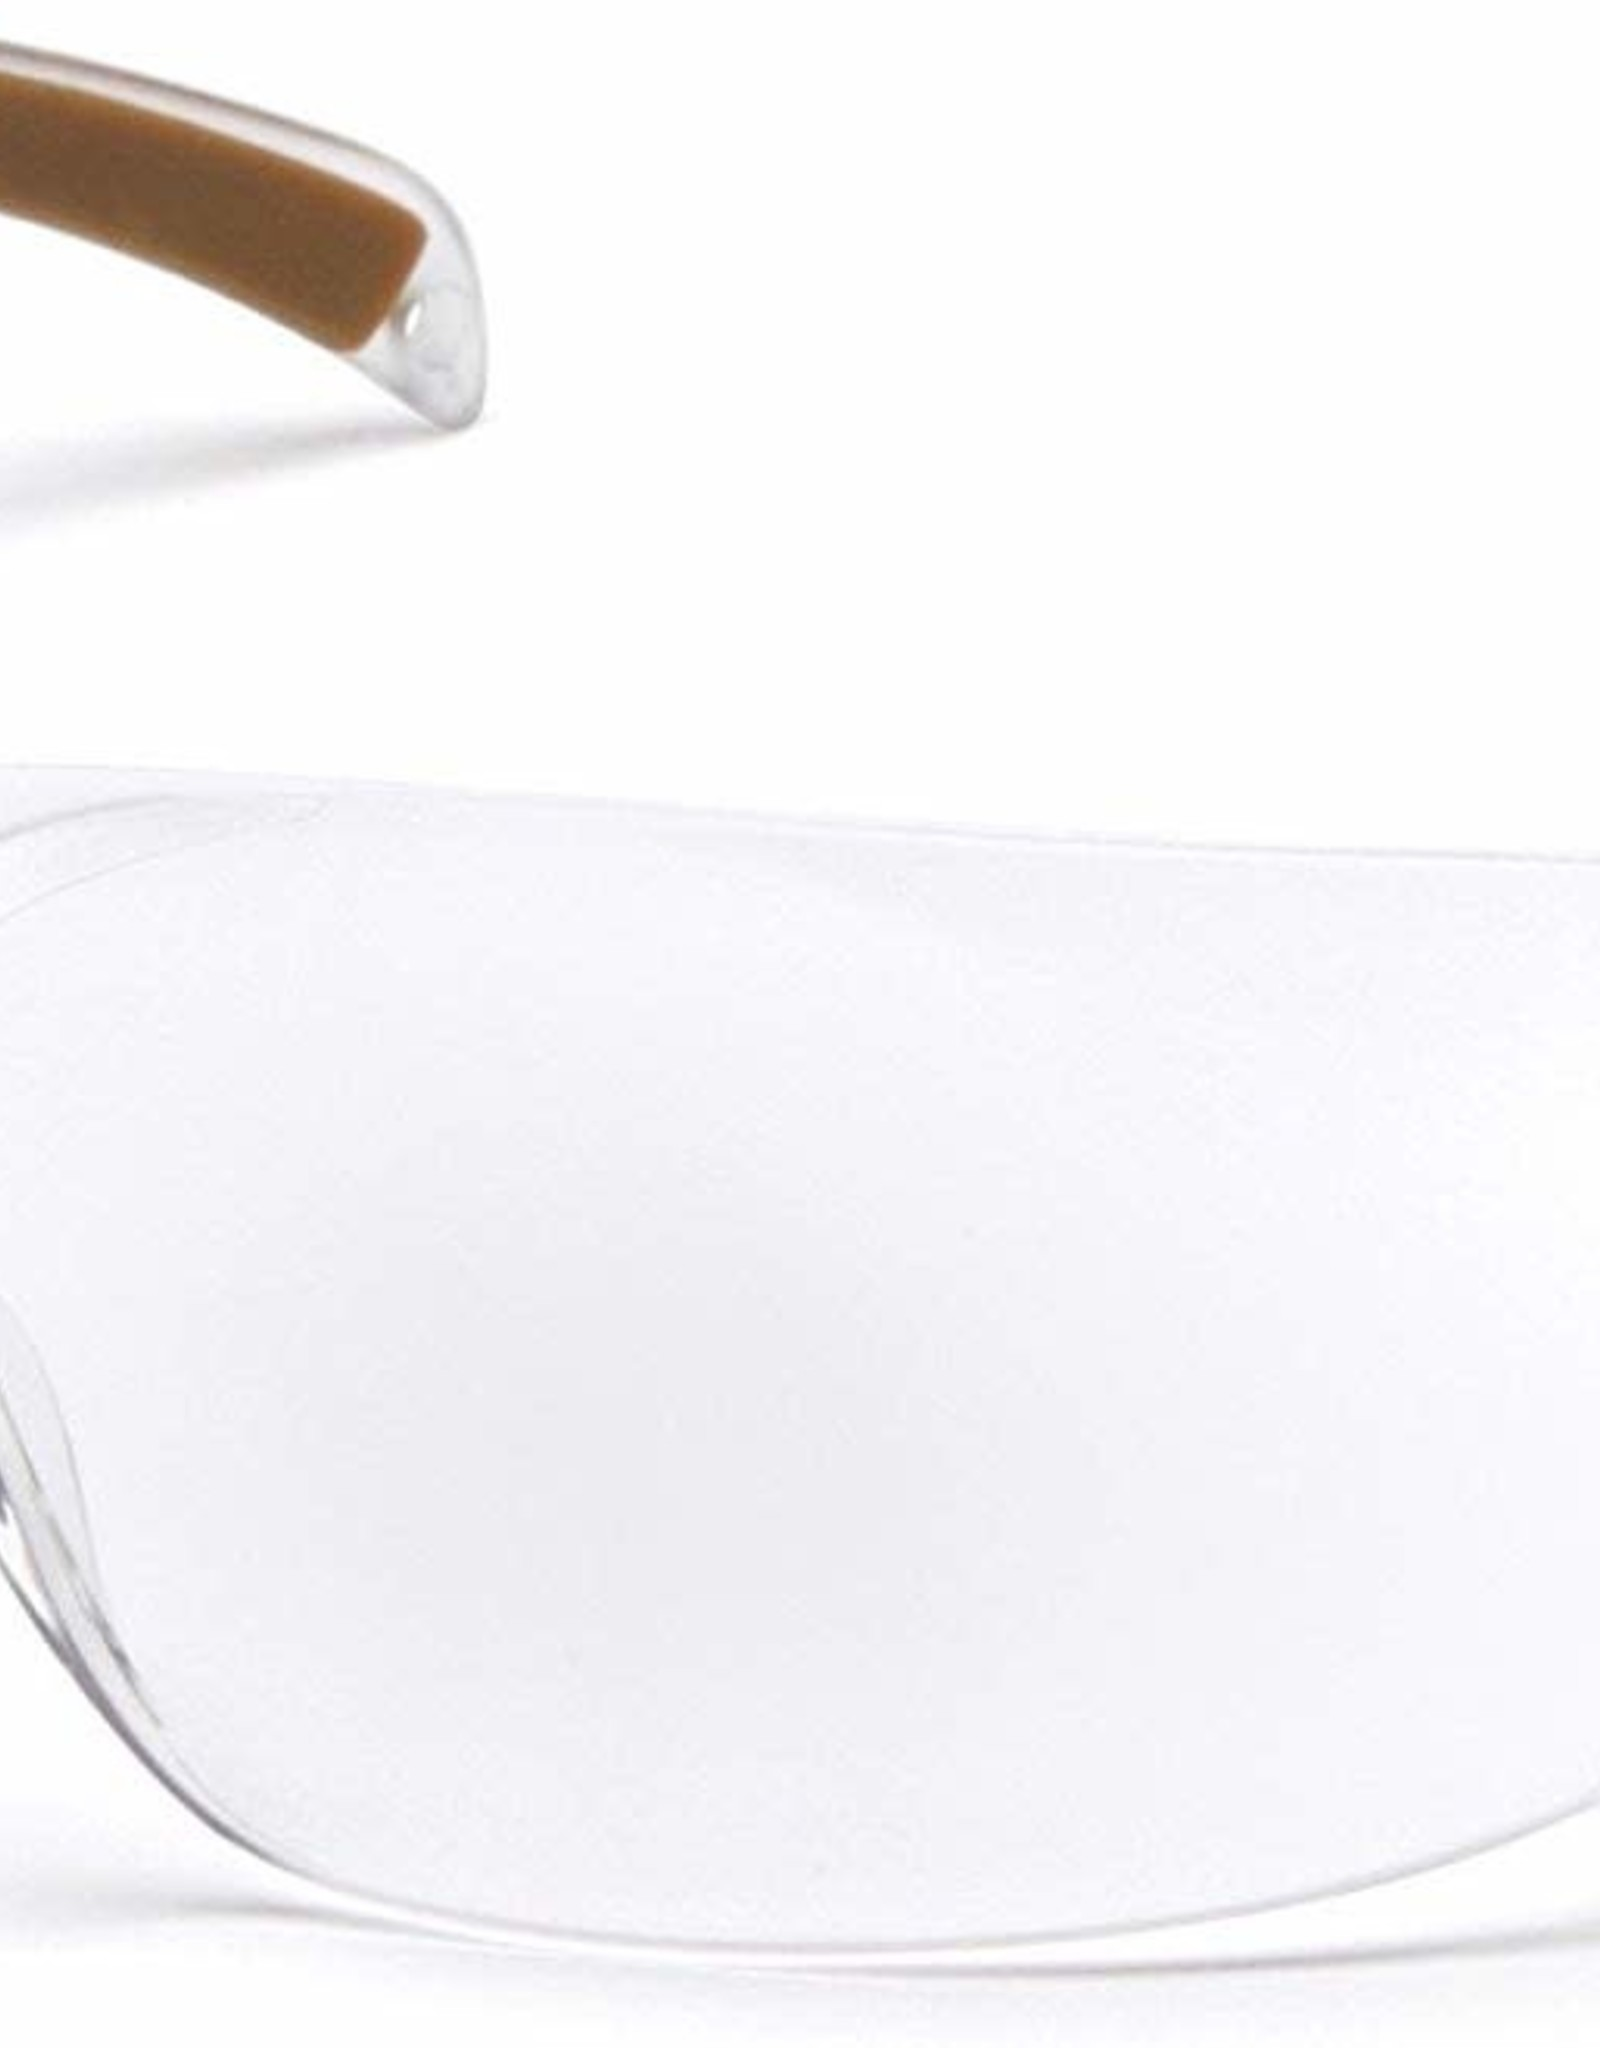 Carhartt Carhartt Billings Safety Glasses with Clear Anti-fog Lens